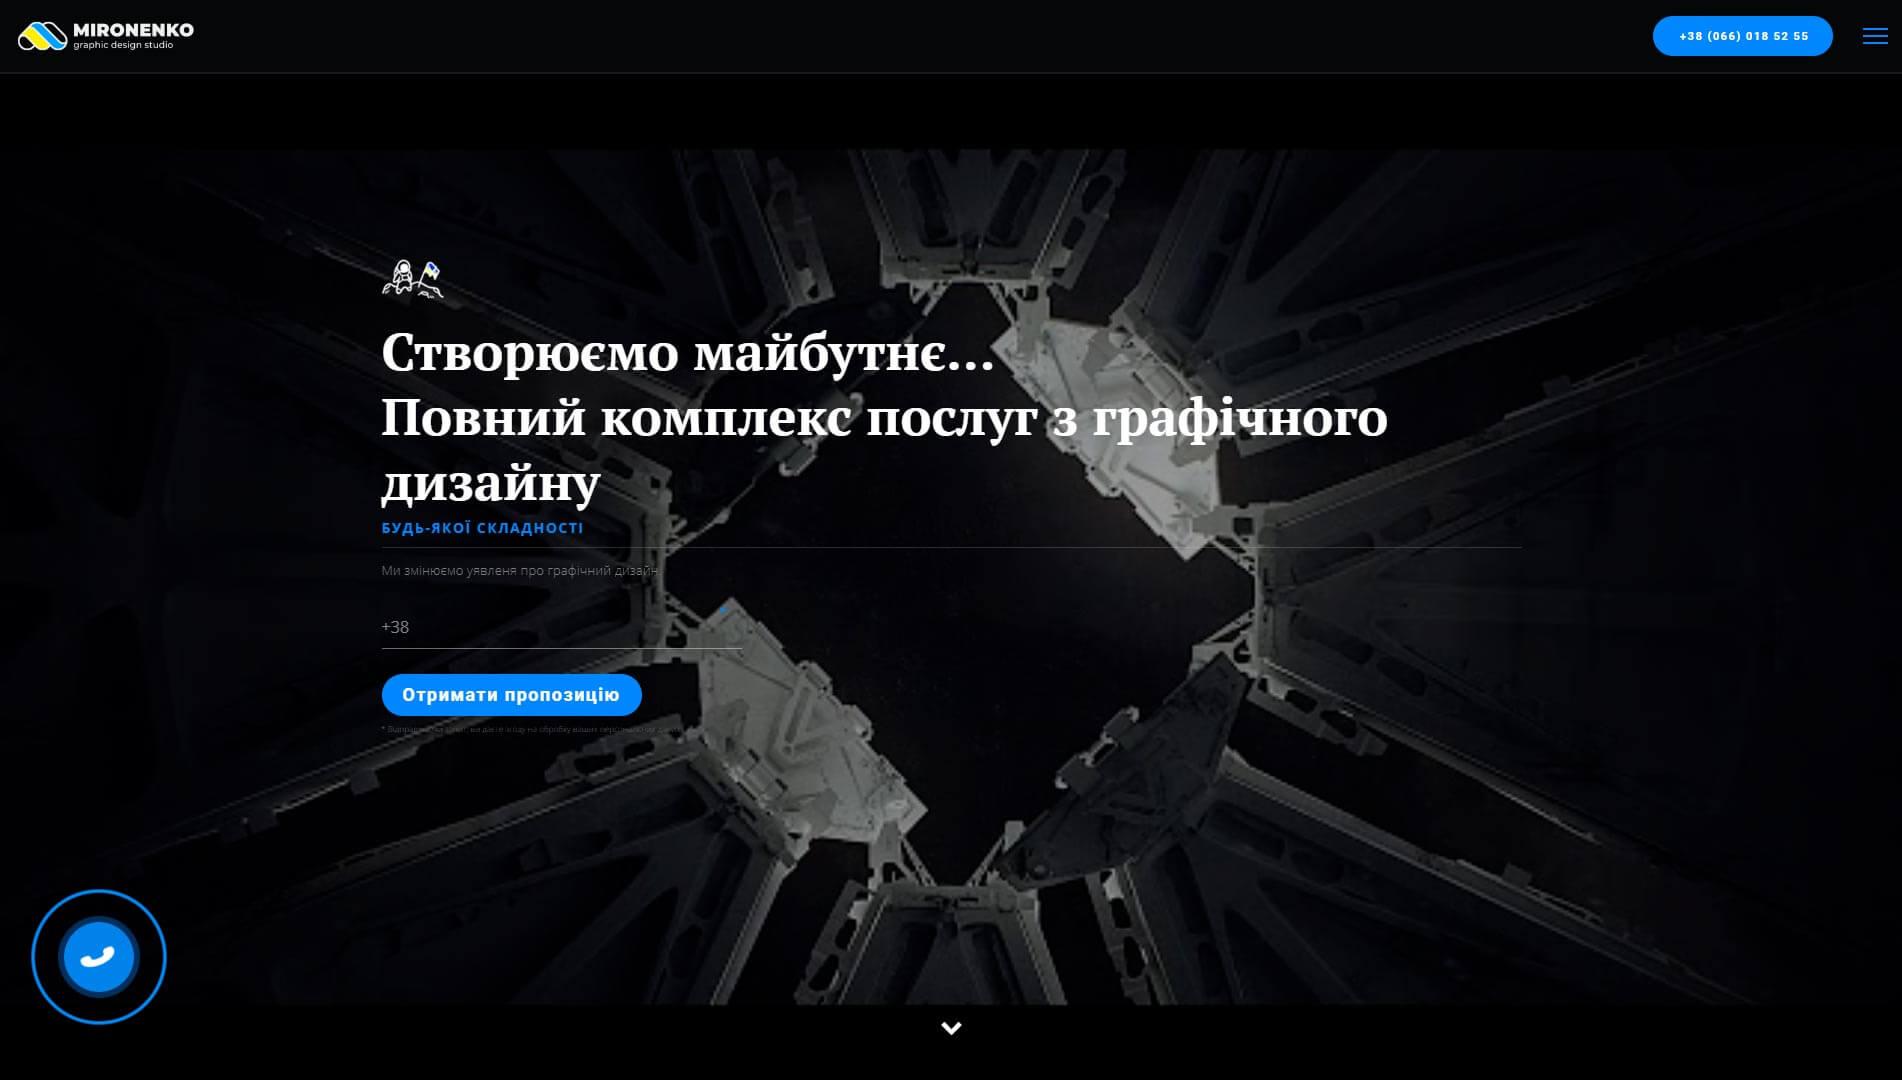 Mironenko - обзор компании, услуги, отзывы, клиенты, Фото № 1 - google-seo.pro